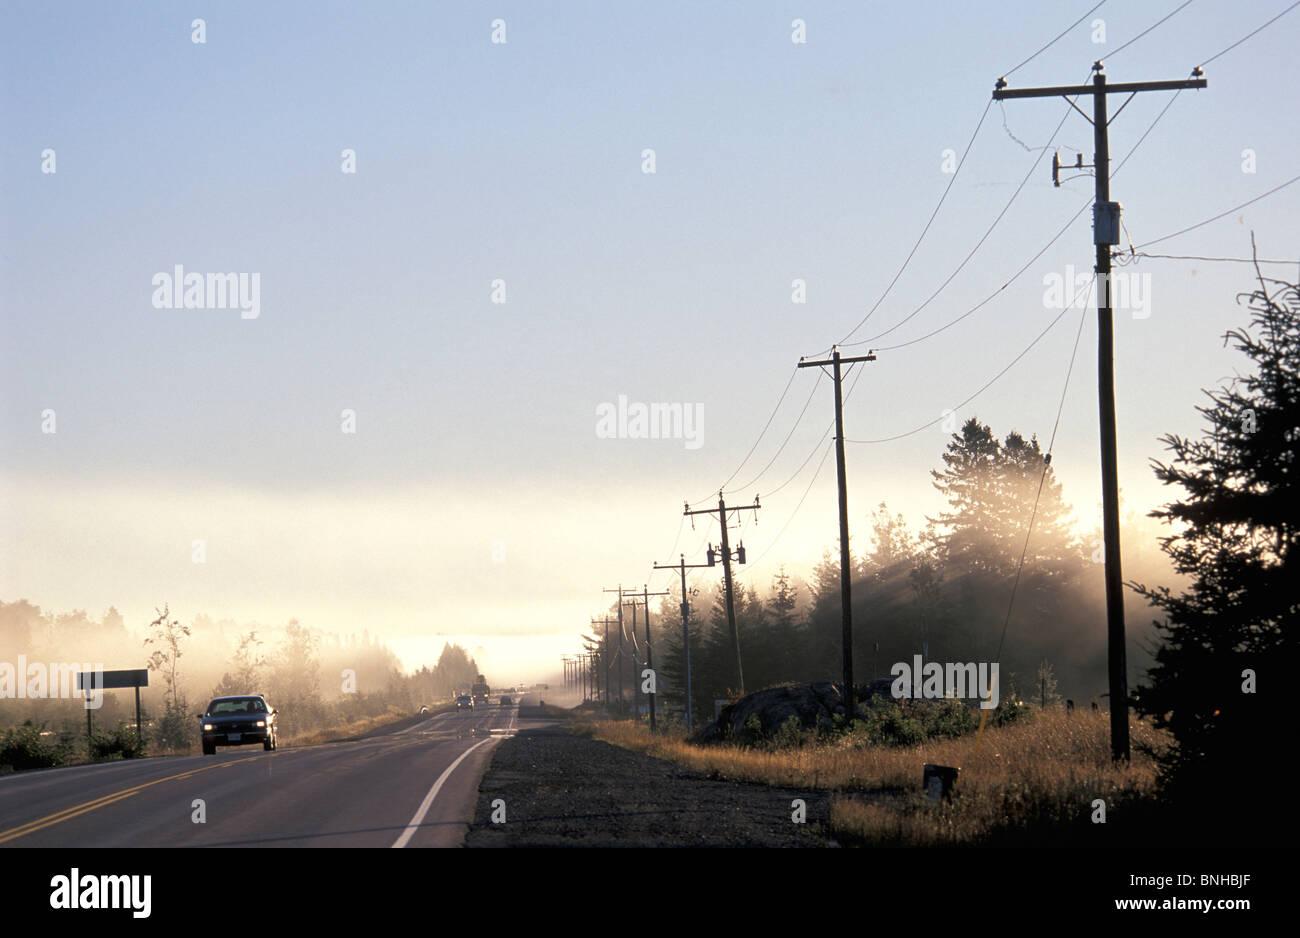 Canada Espanola Ontario Highway 17 Near Espanola Country Road Power Lines Car Rural Foggy Landscape Scenery North - Stock Image